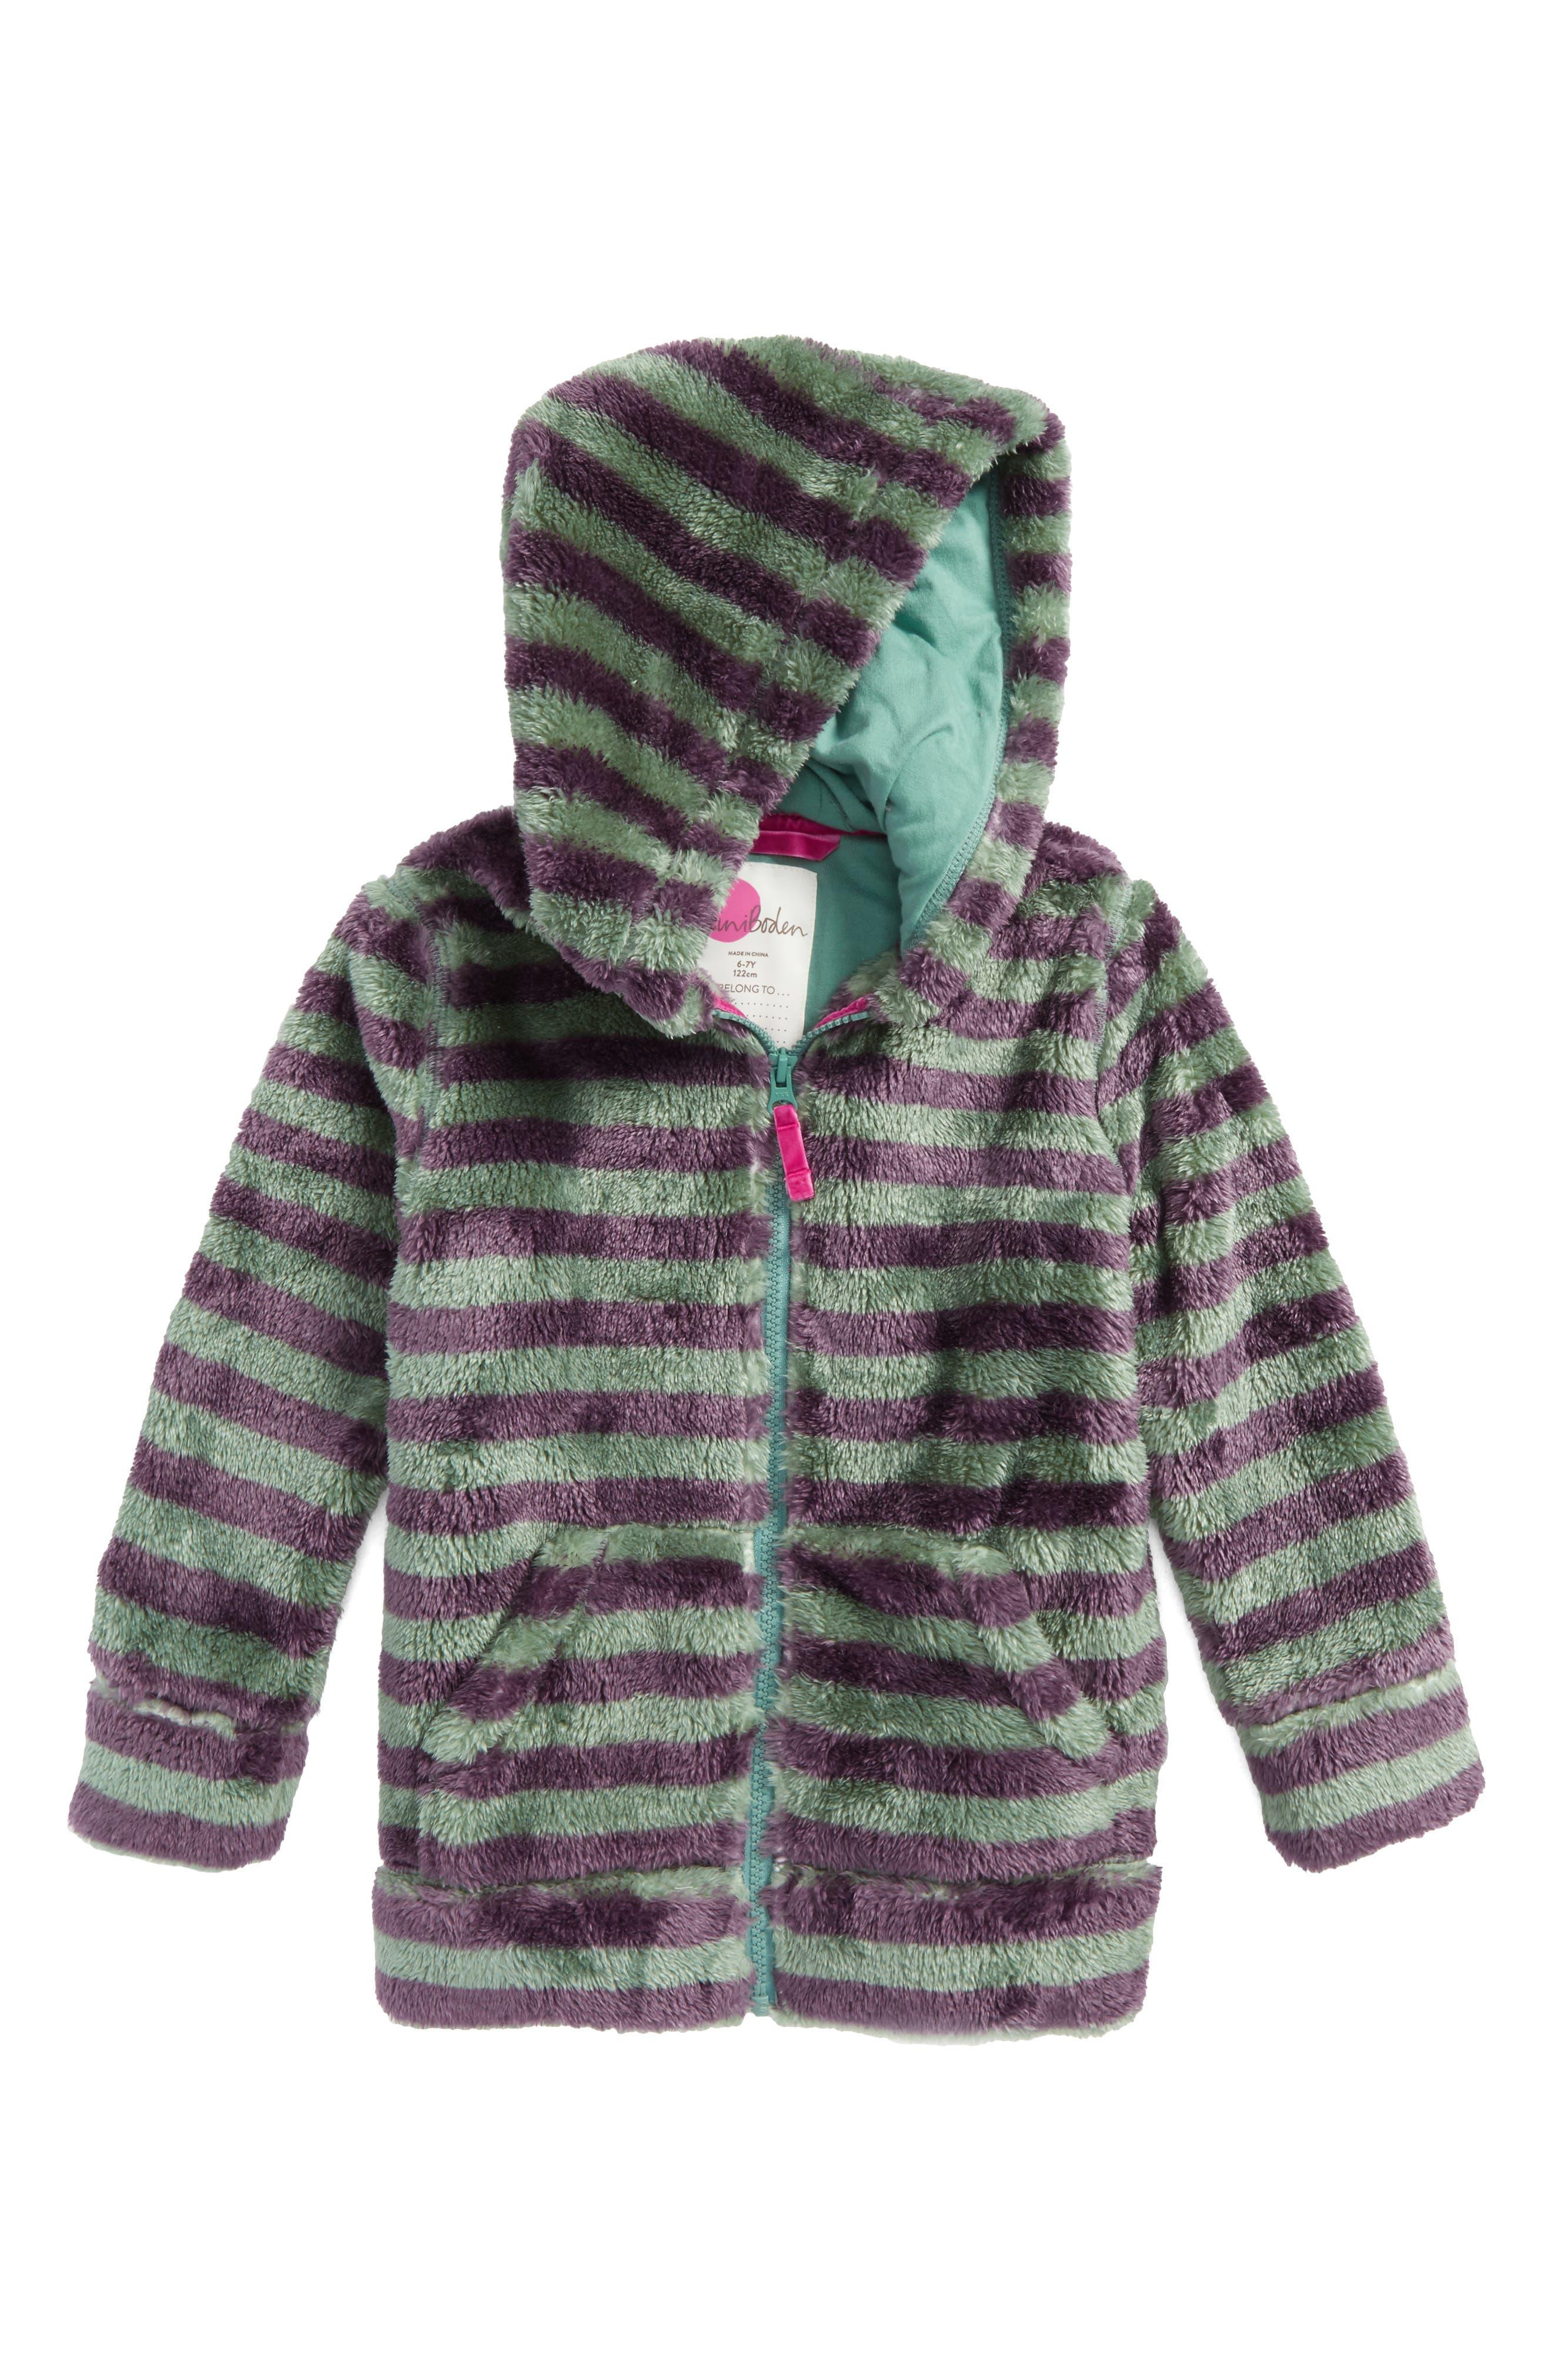 Teddy Zip-Up Hoodie,                         Main,                         color, Csarite Green/ Misty Purple